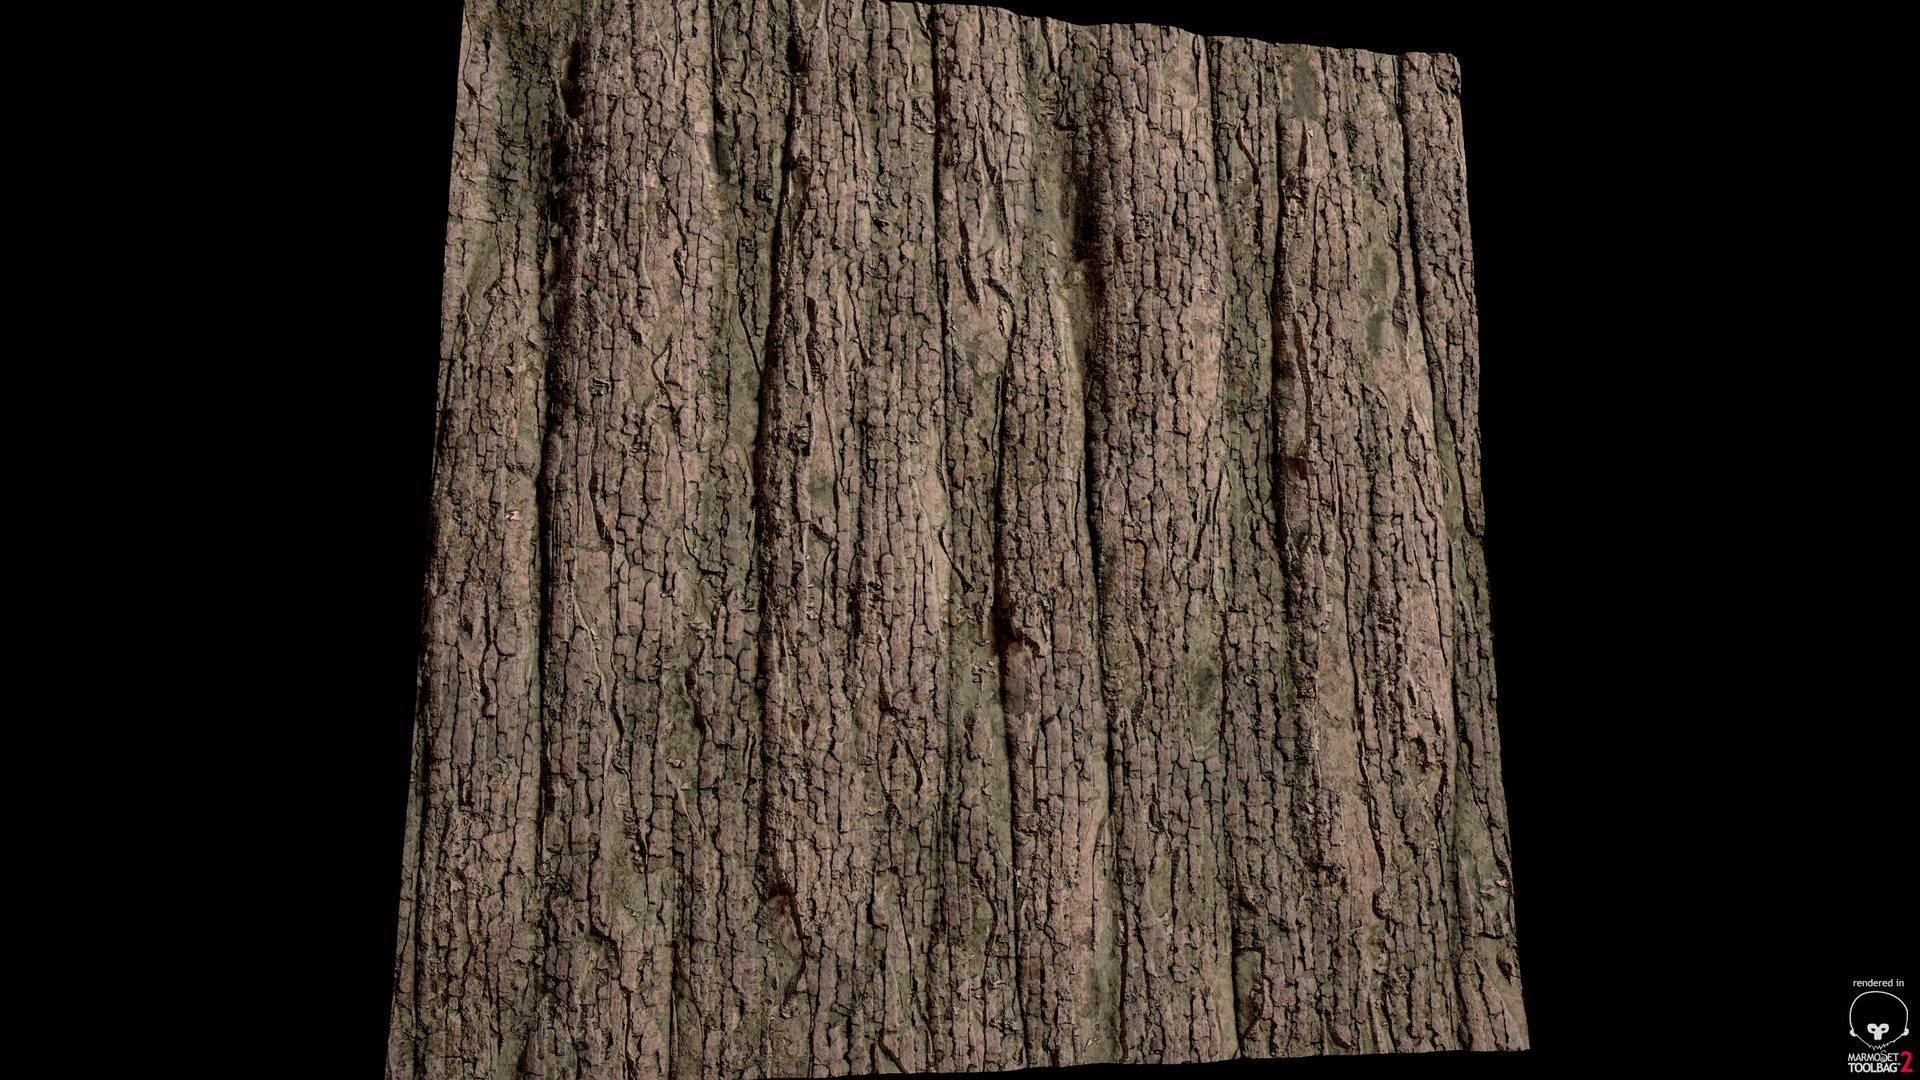 sebastian-schade-substance-bark-2.jpg?1437842305